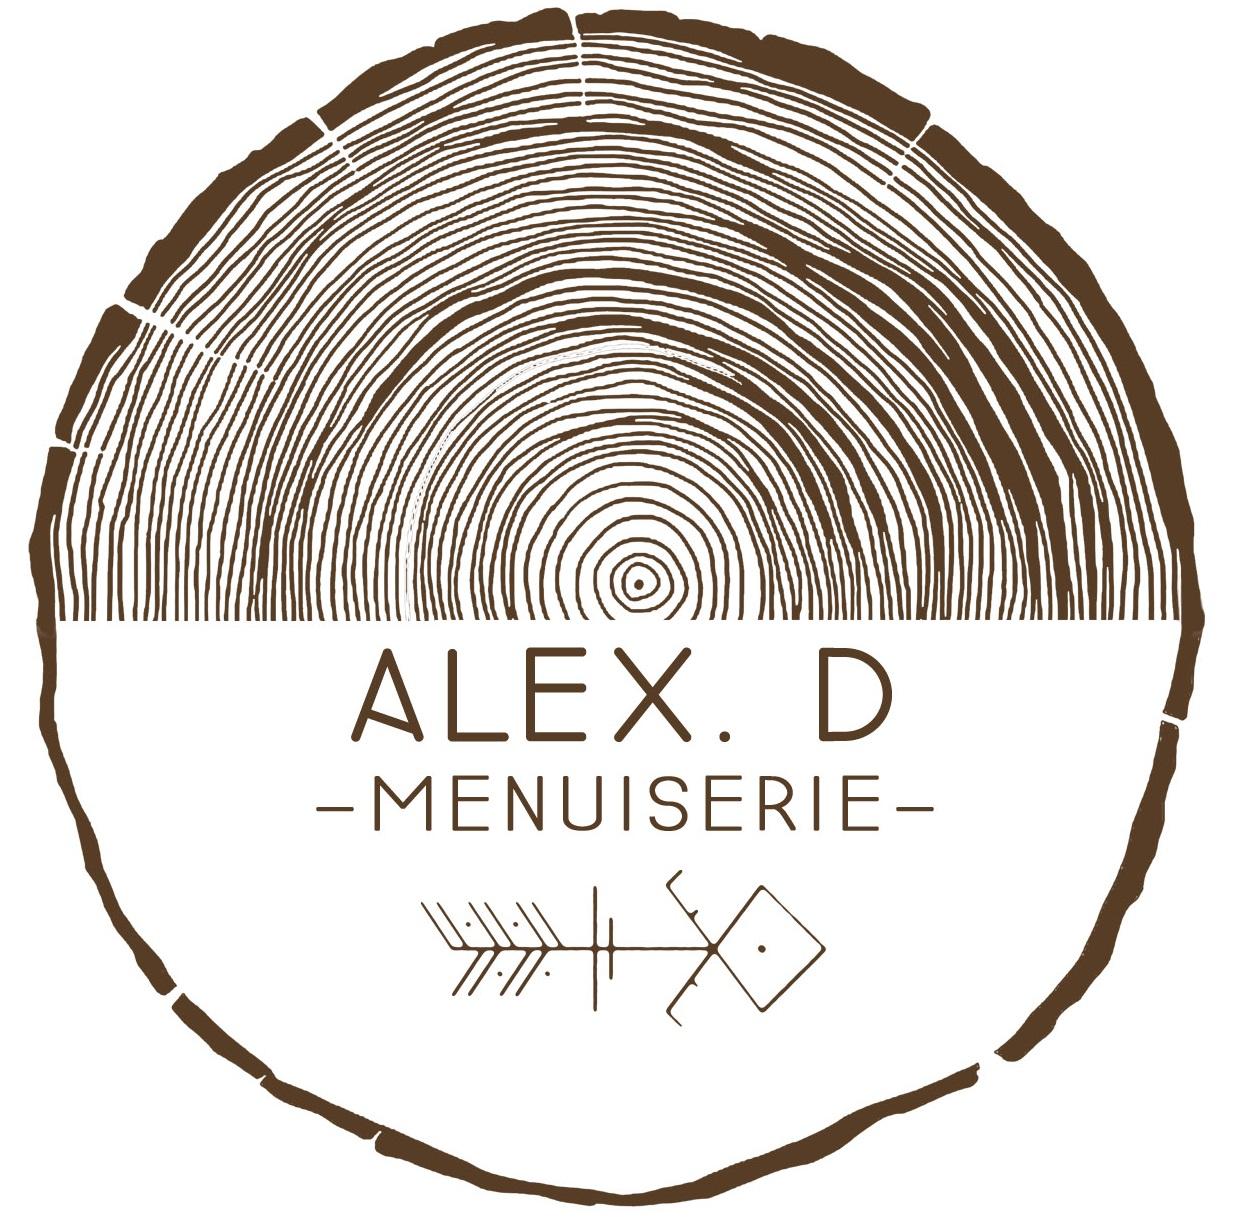 Alex.D Menuiserie